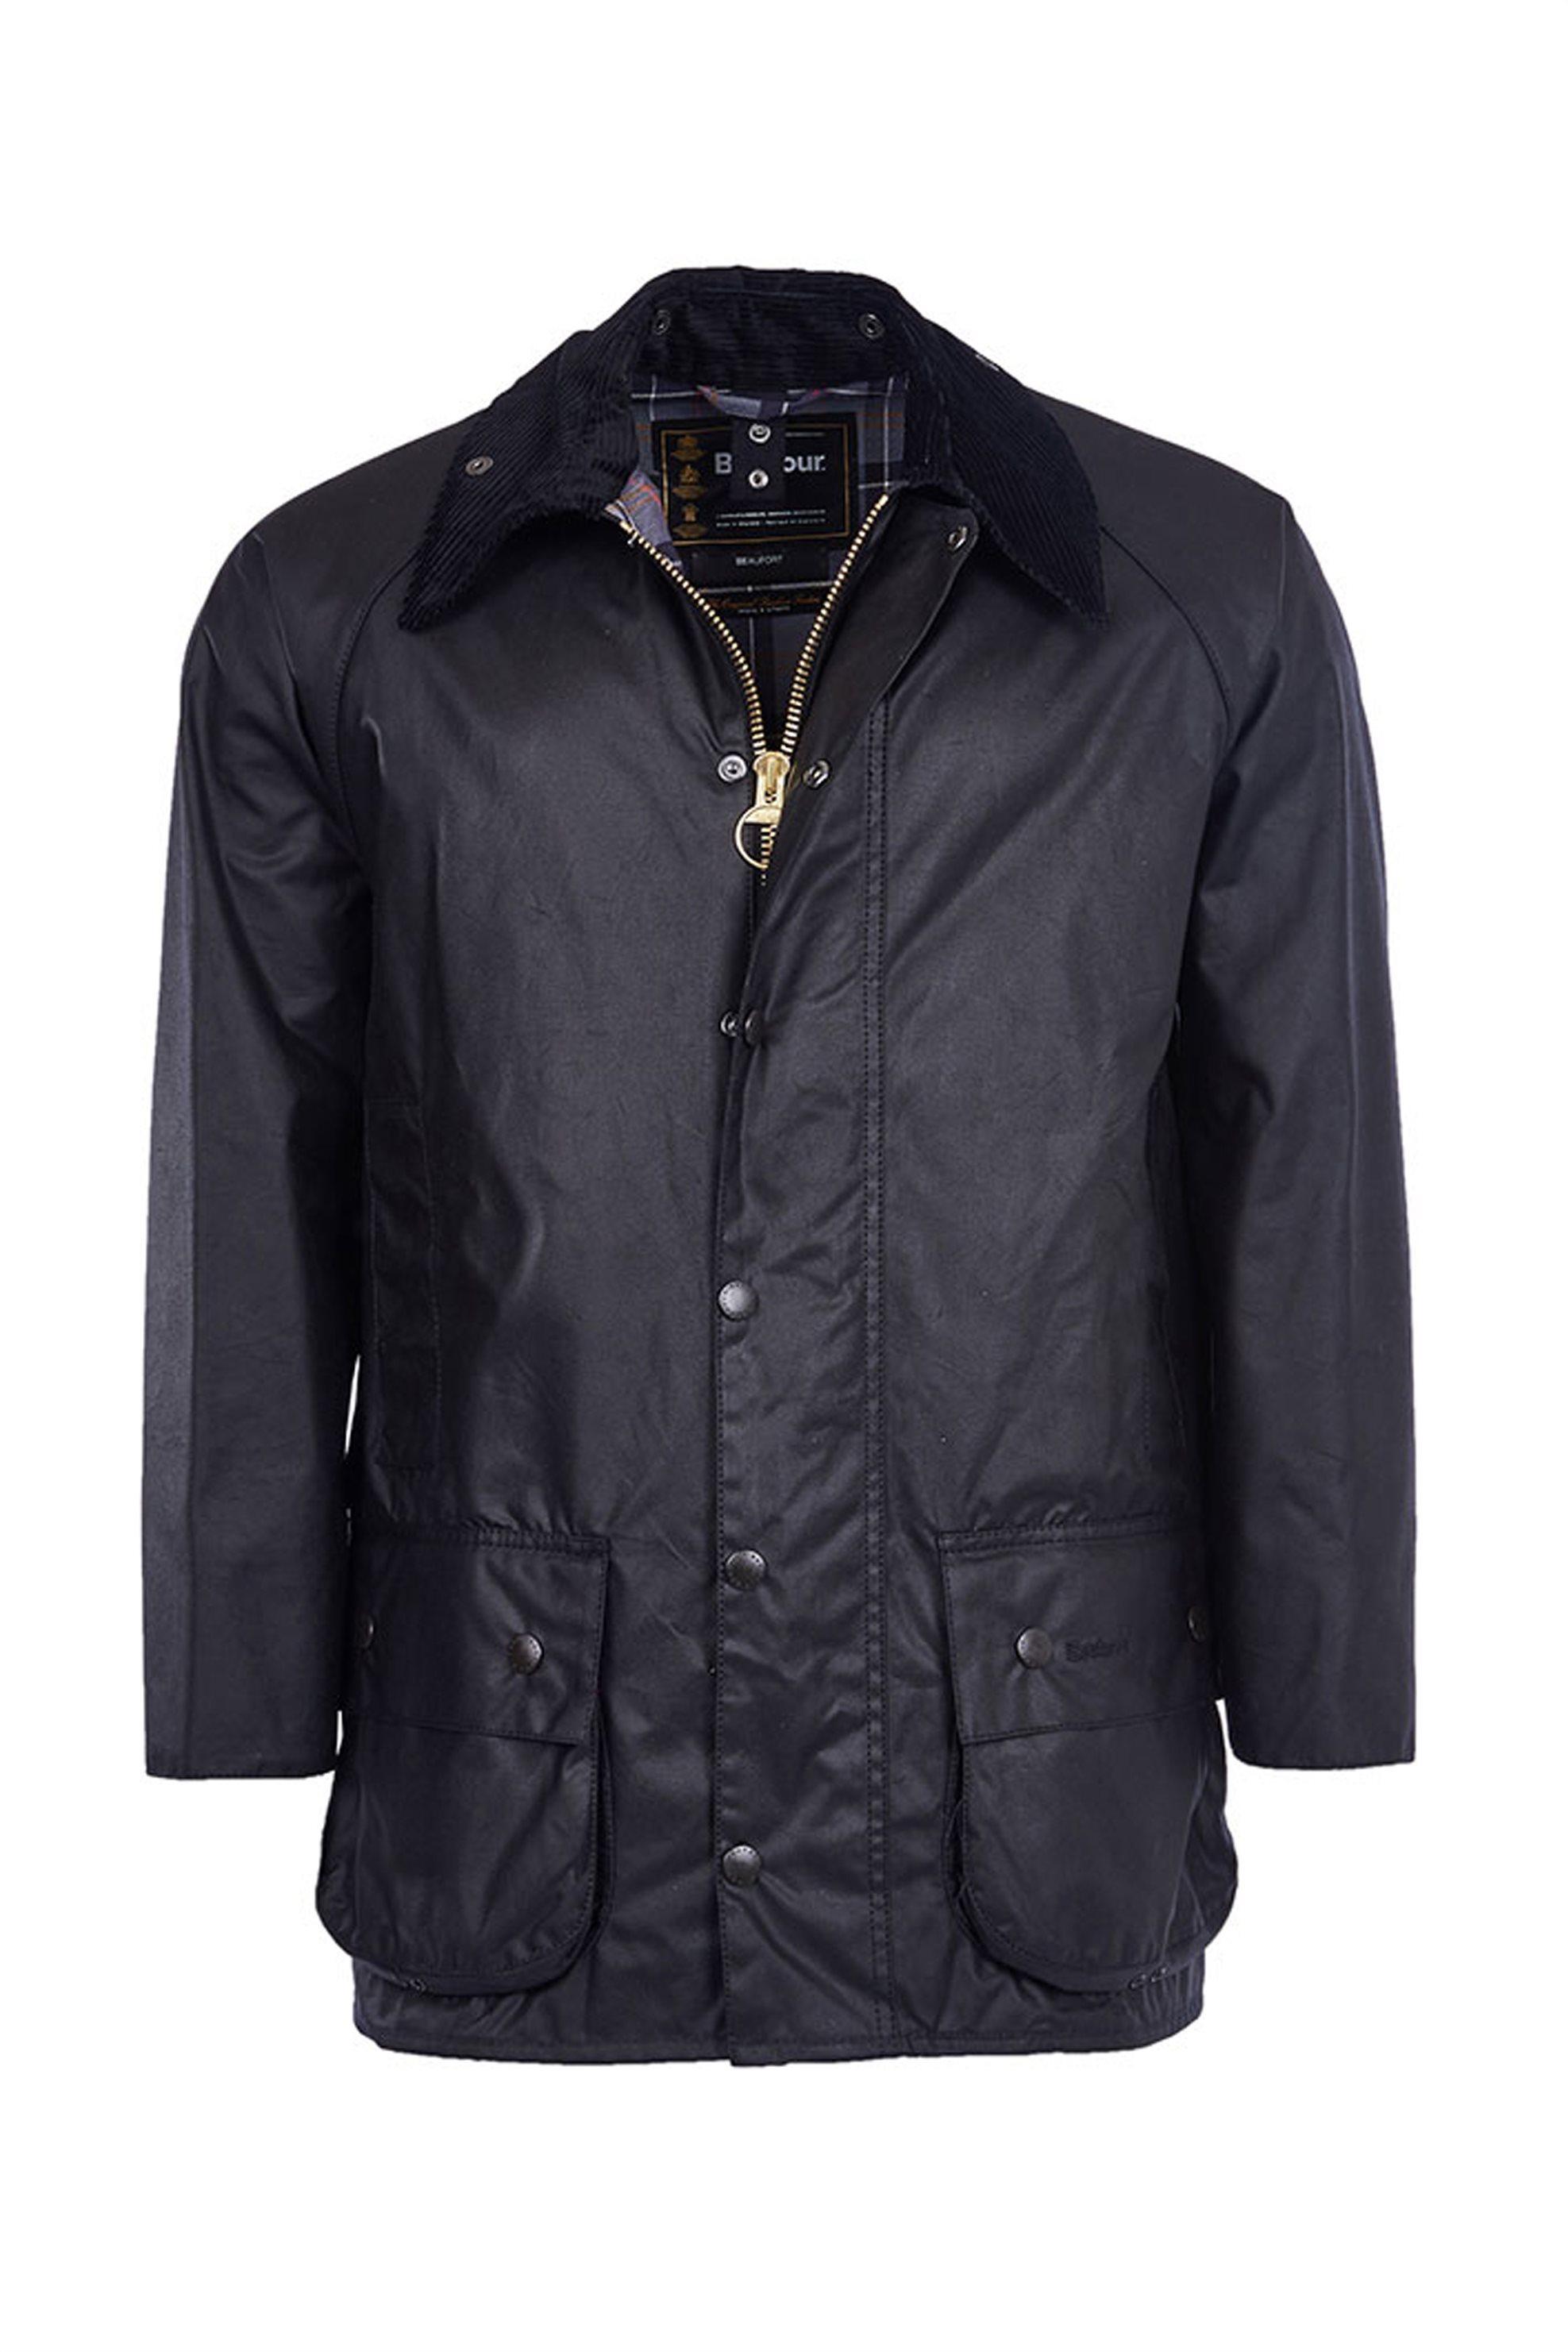 Notos Barbour ανδρικό κερωμένο μπουφάν Beaufort jacket - MWX0017 - Μαύρο 9c30c8df700